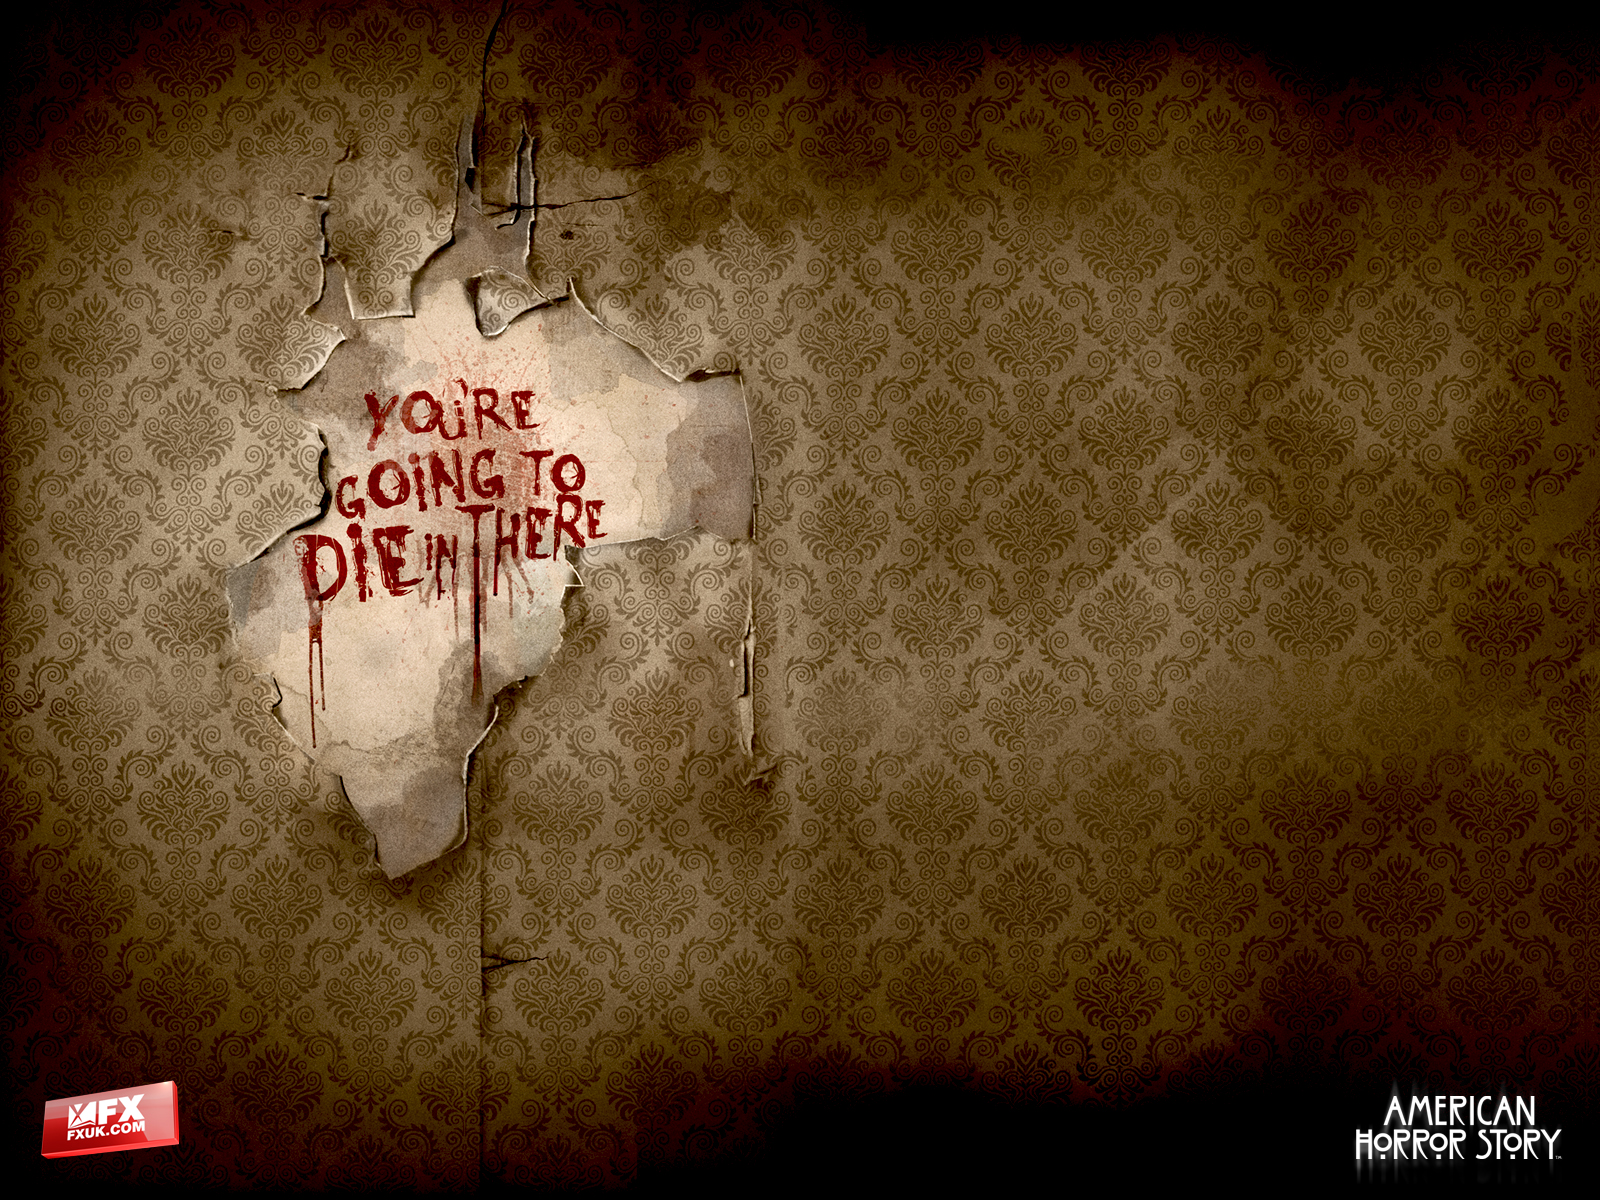 American Horror Story american horror story 26657345 1600 1200 1600x1200